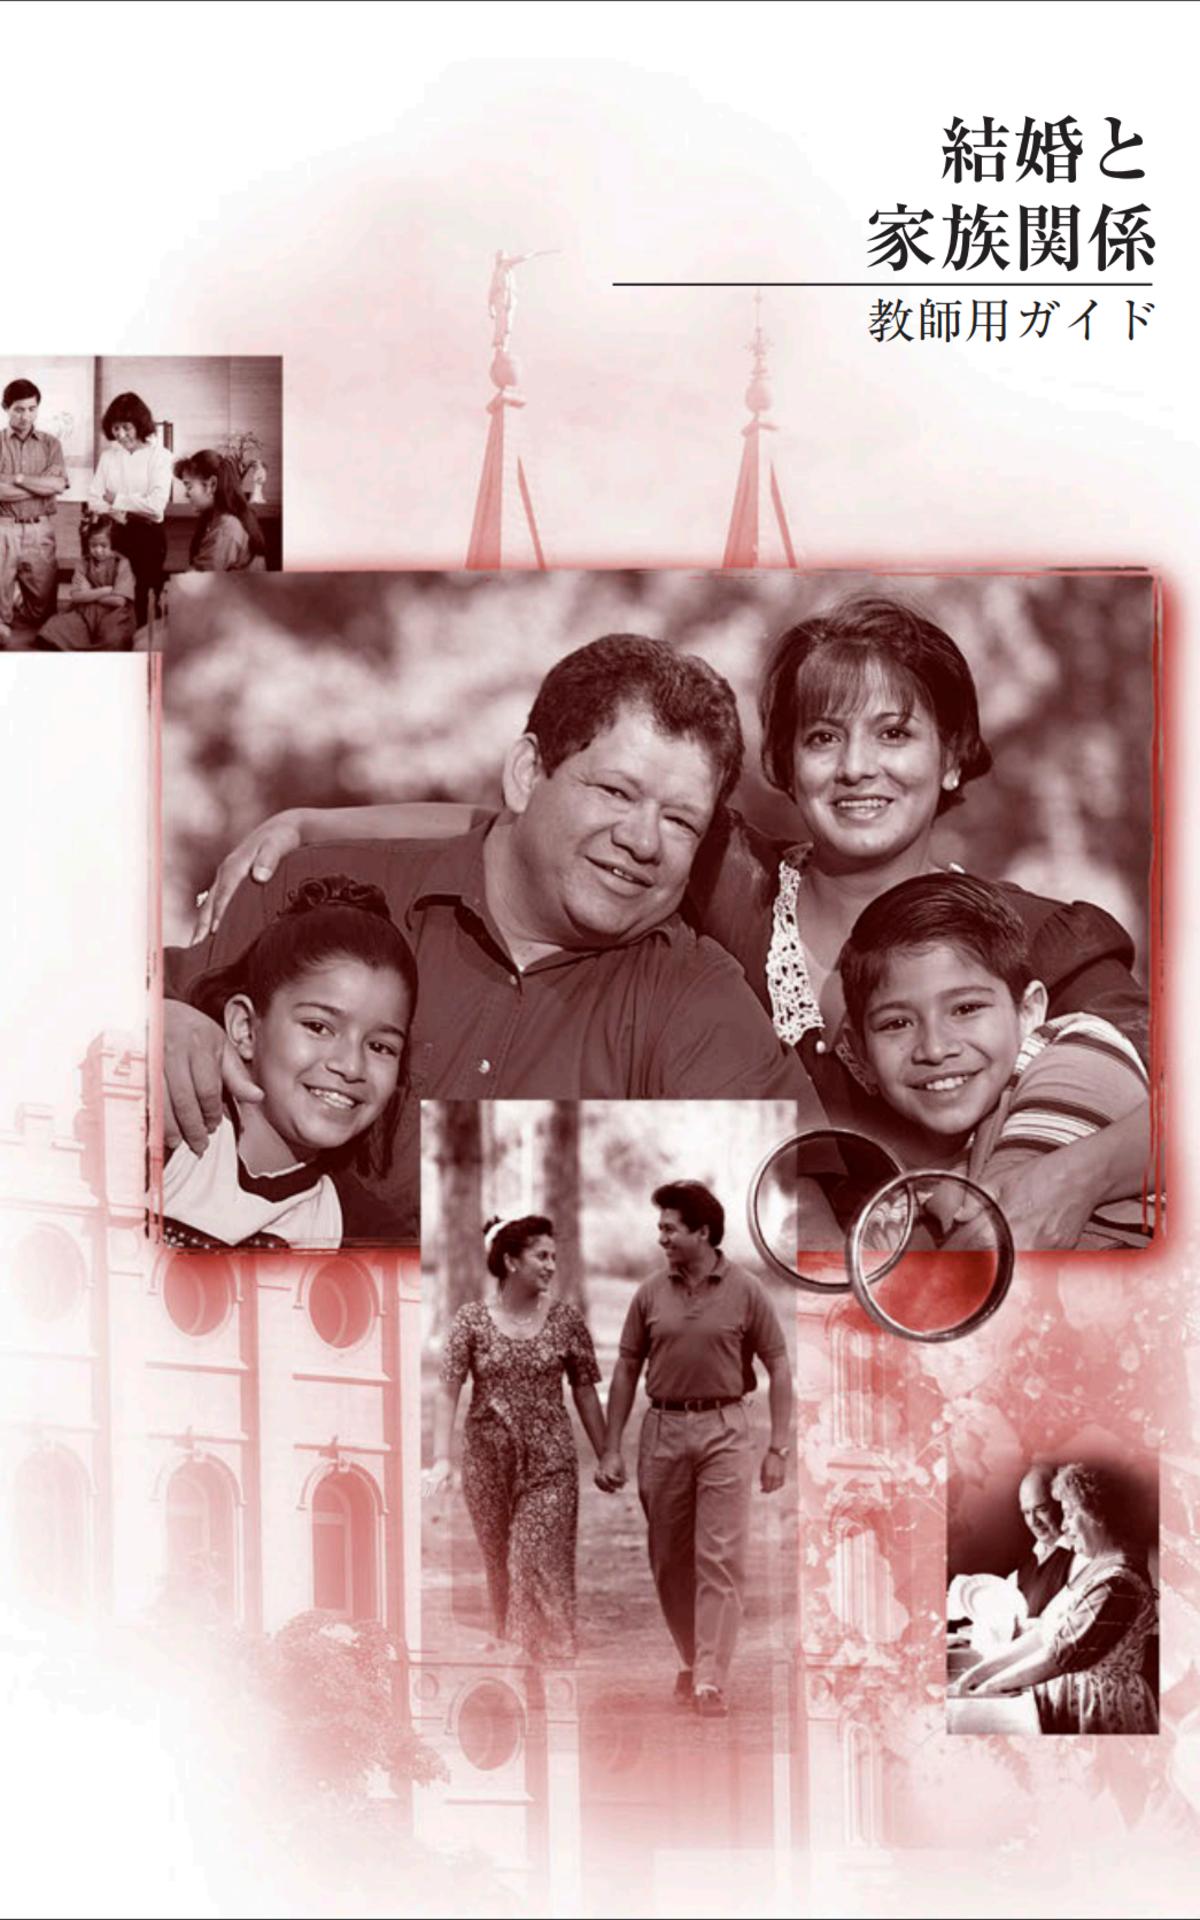 結婚と家族関係